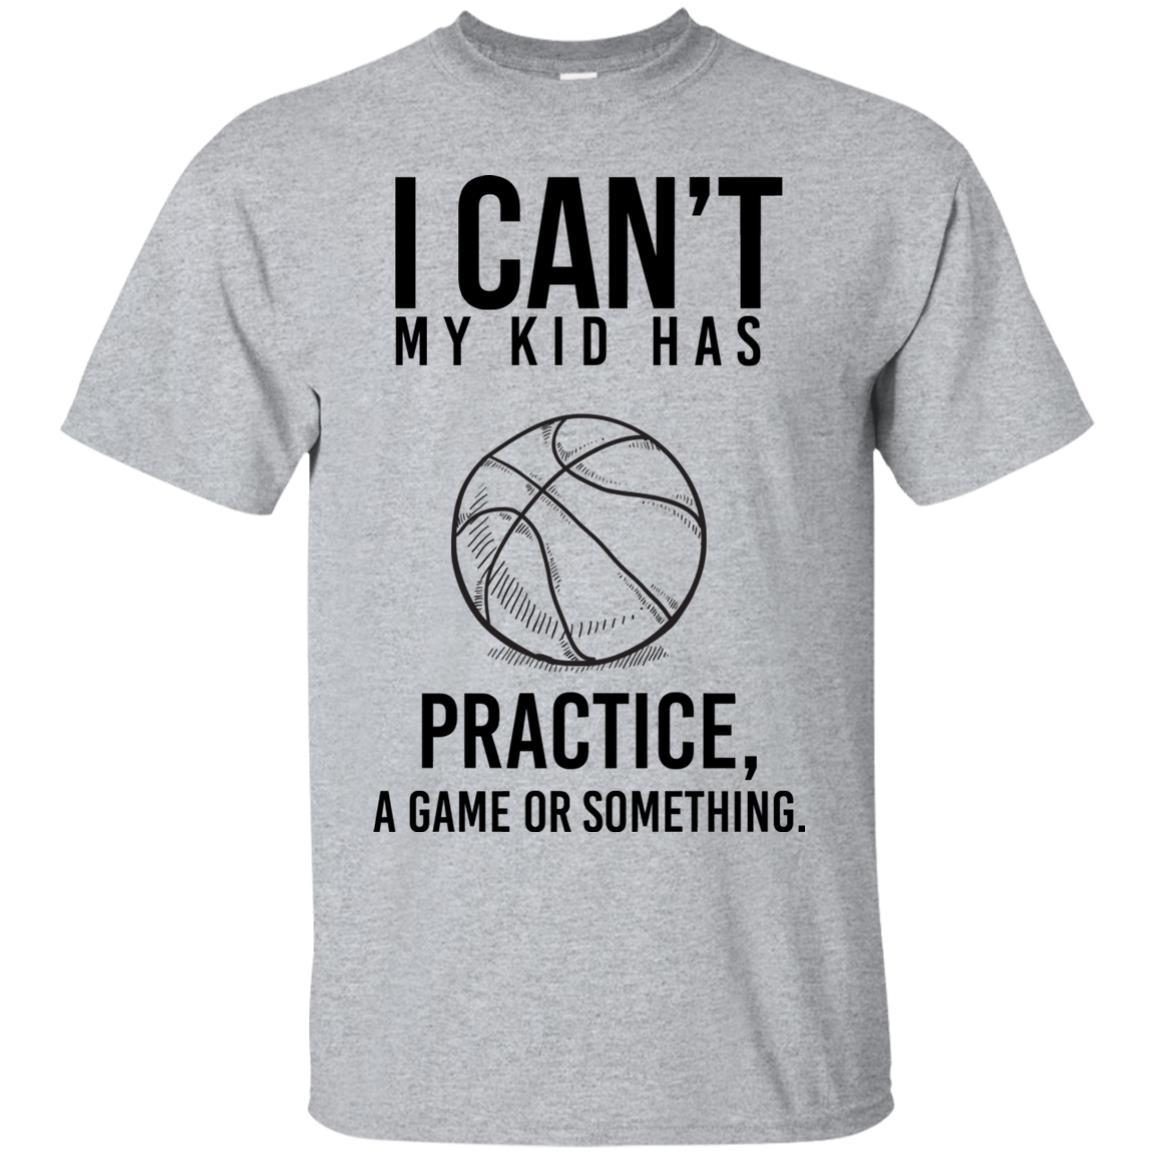 aec6c7e24 I Can't My Kid Has Practice A Game Or Something T-Shirts